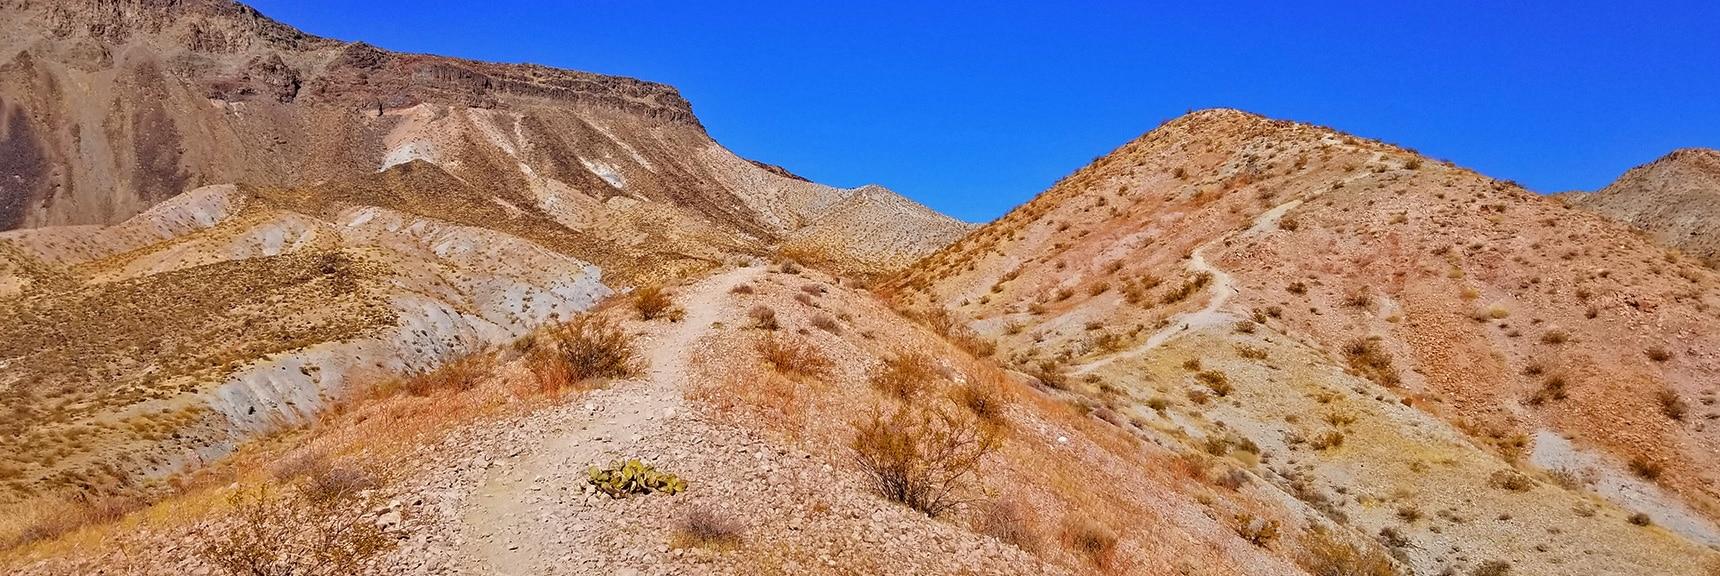 Ascending the High Ridge Trail Toward Fortification Hill   Fortification Hill   Lake Mead National Recreation Area, Arizona